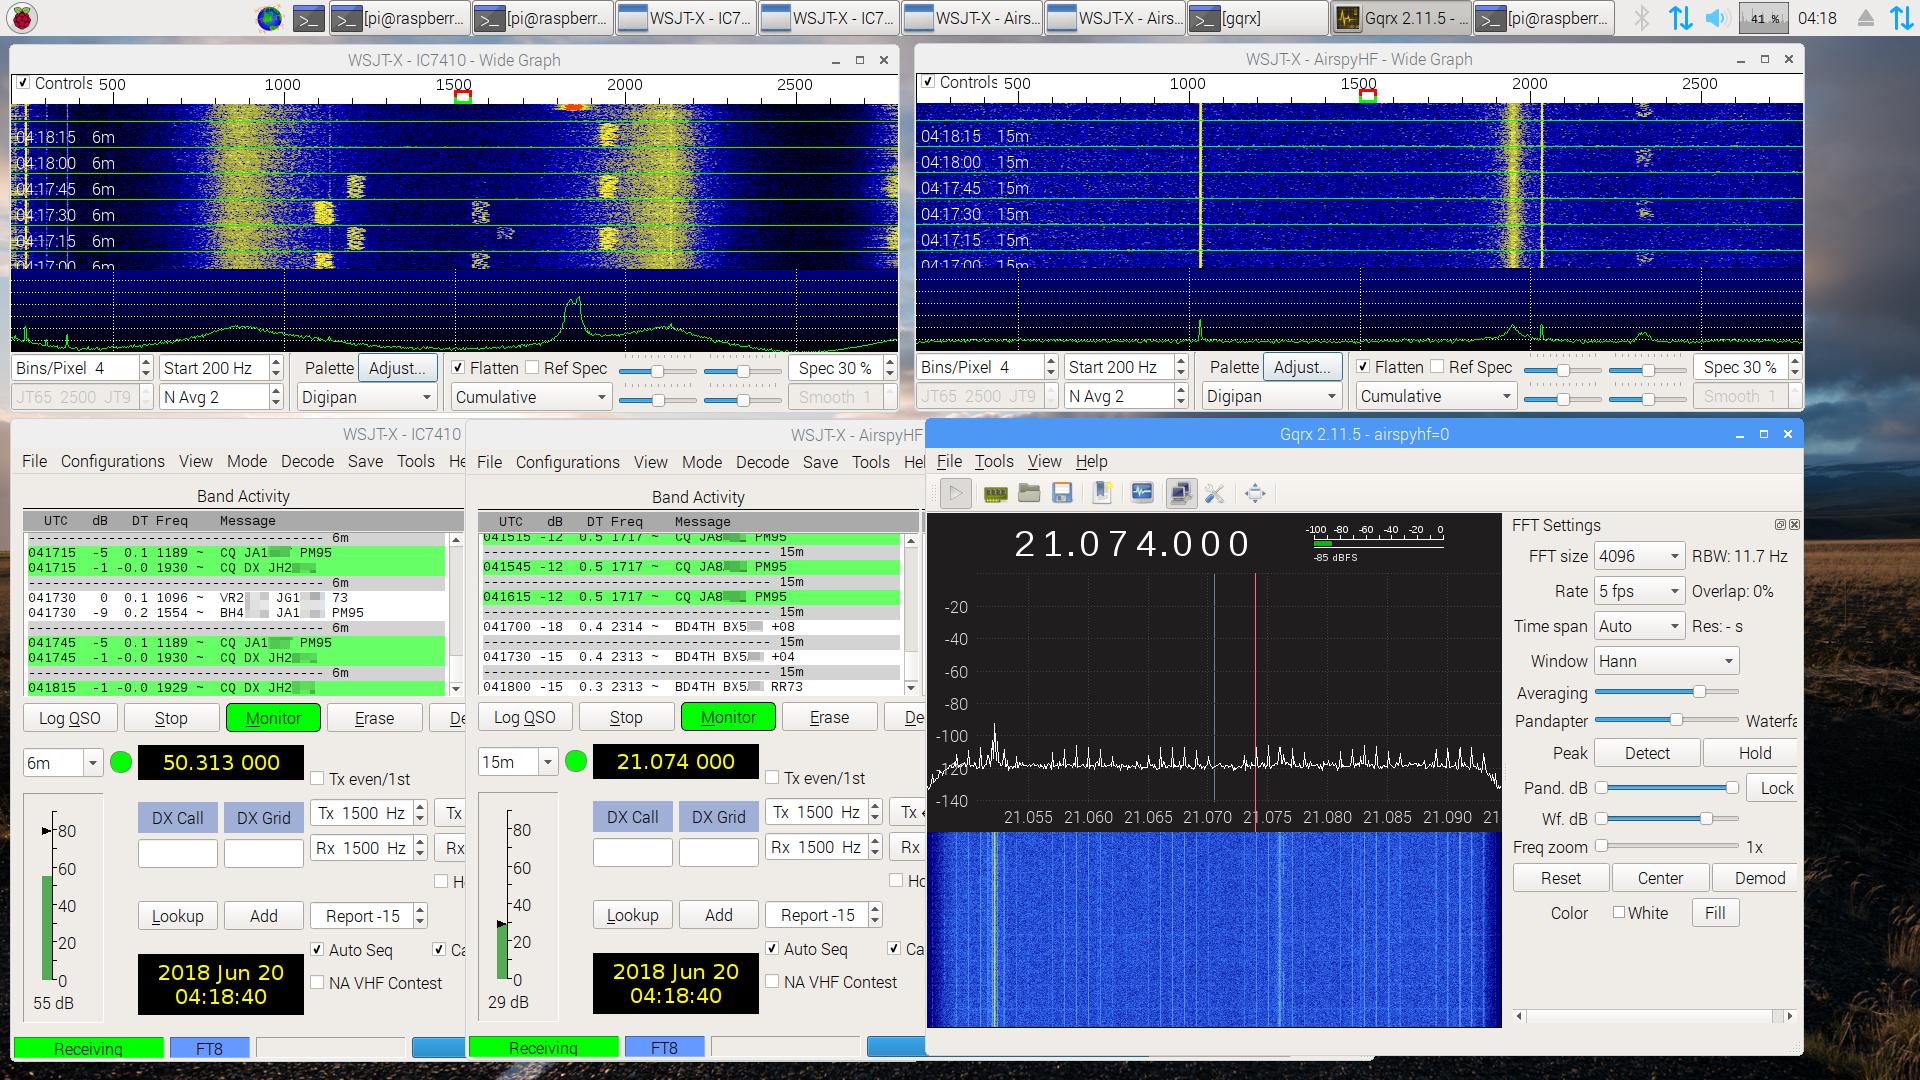 Airspy HF+, IC-7410, and Raspberry Pi 3 – Spinor Lab